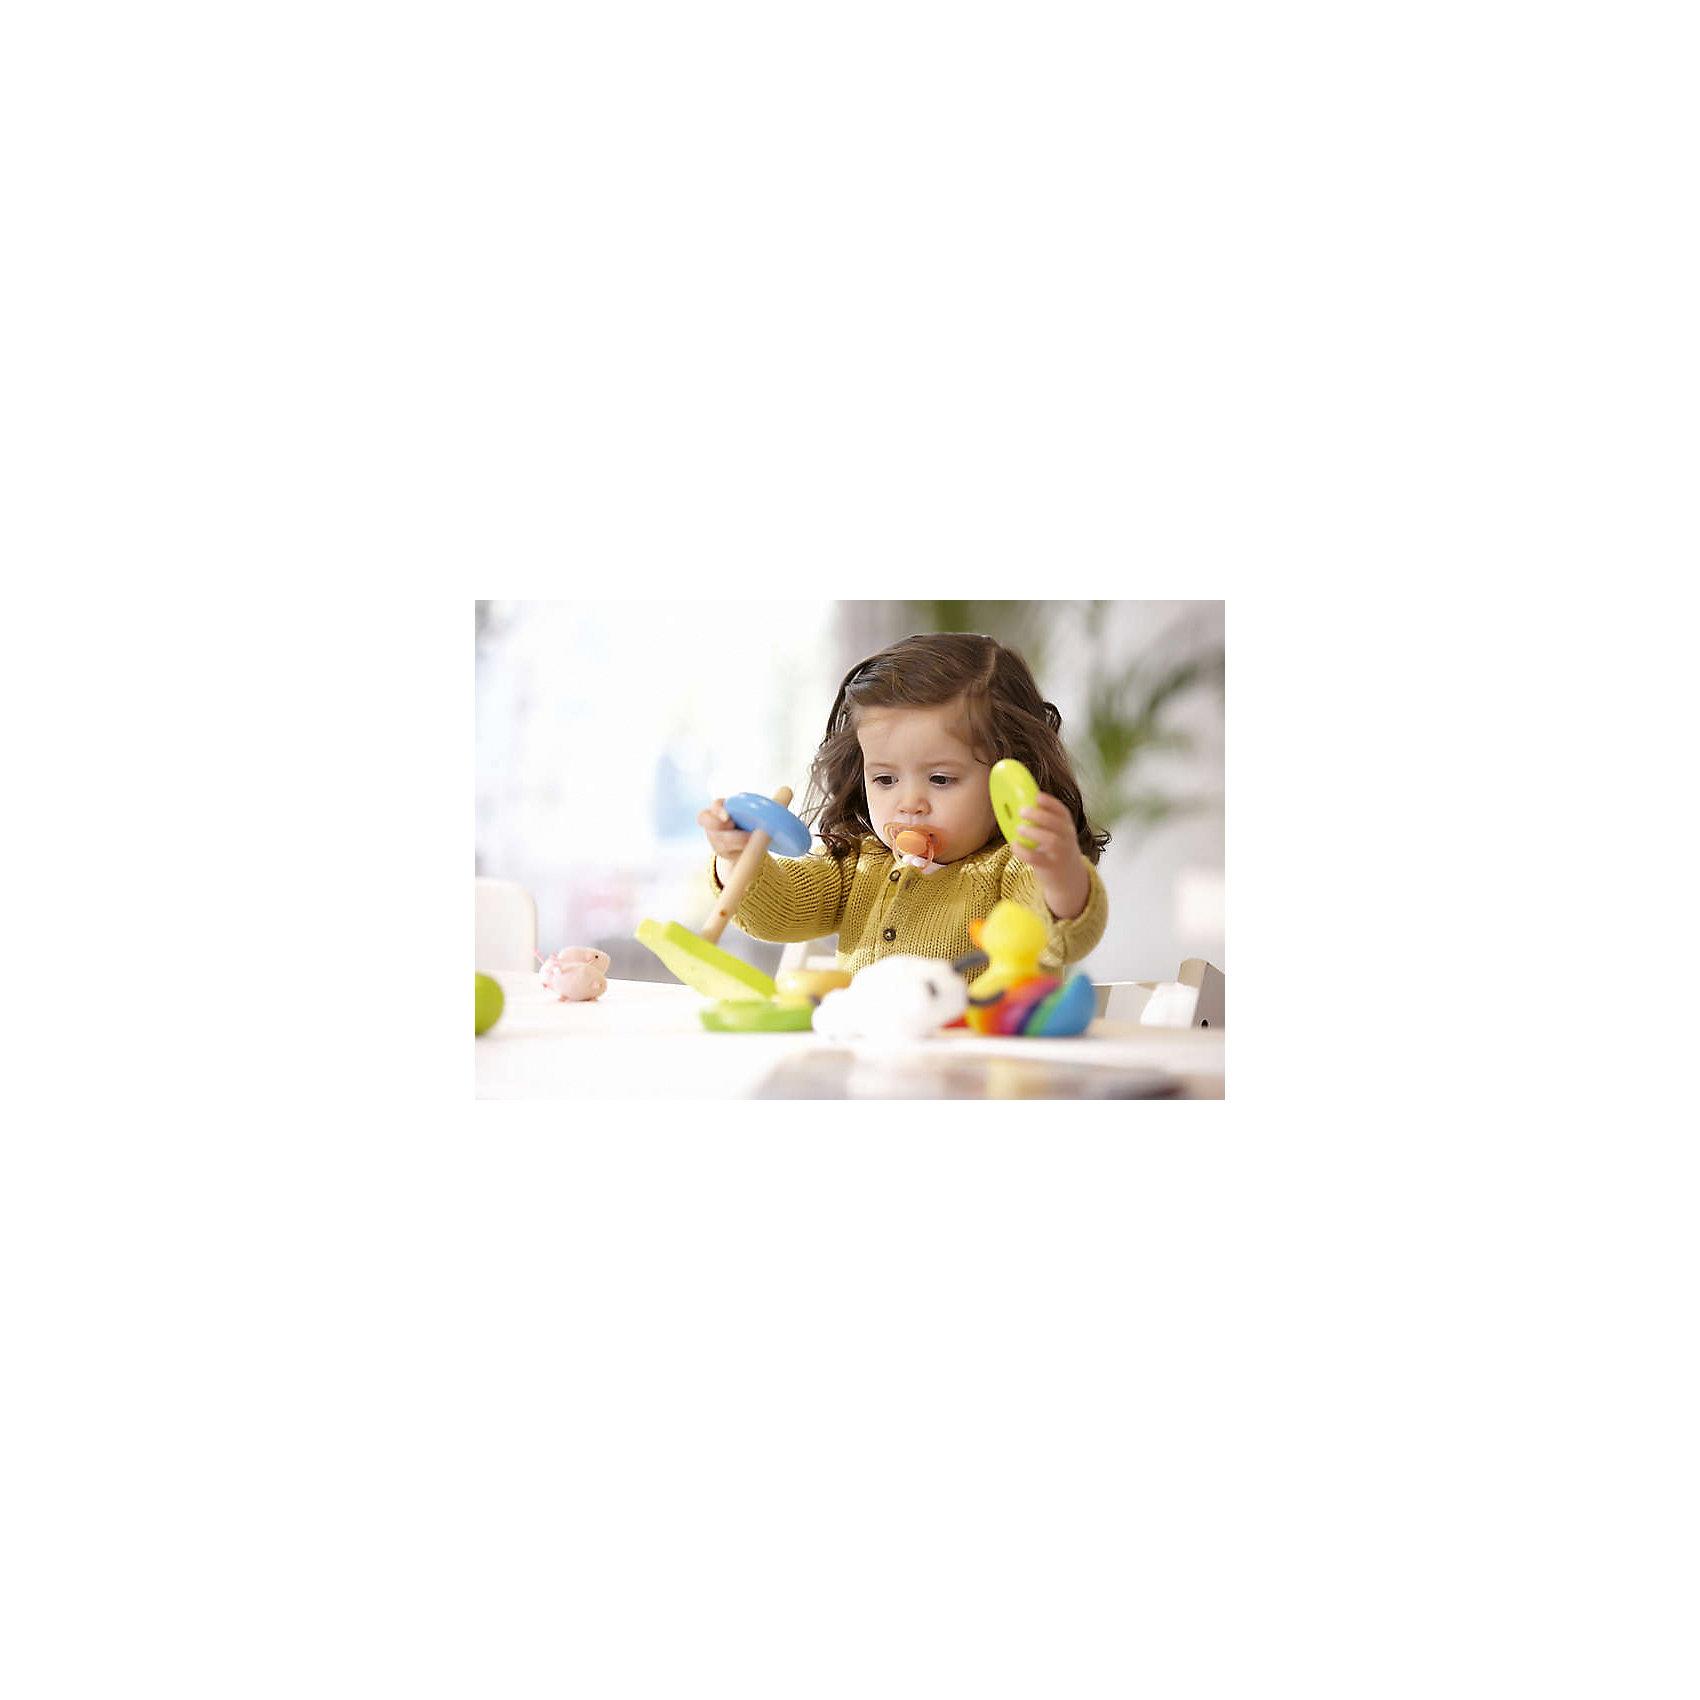 Соска-пустышка 6-18 мес, 2 шт., Philips Avent, розовый/желтый